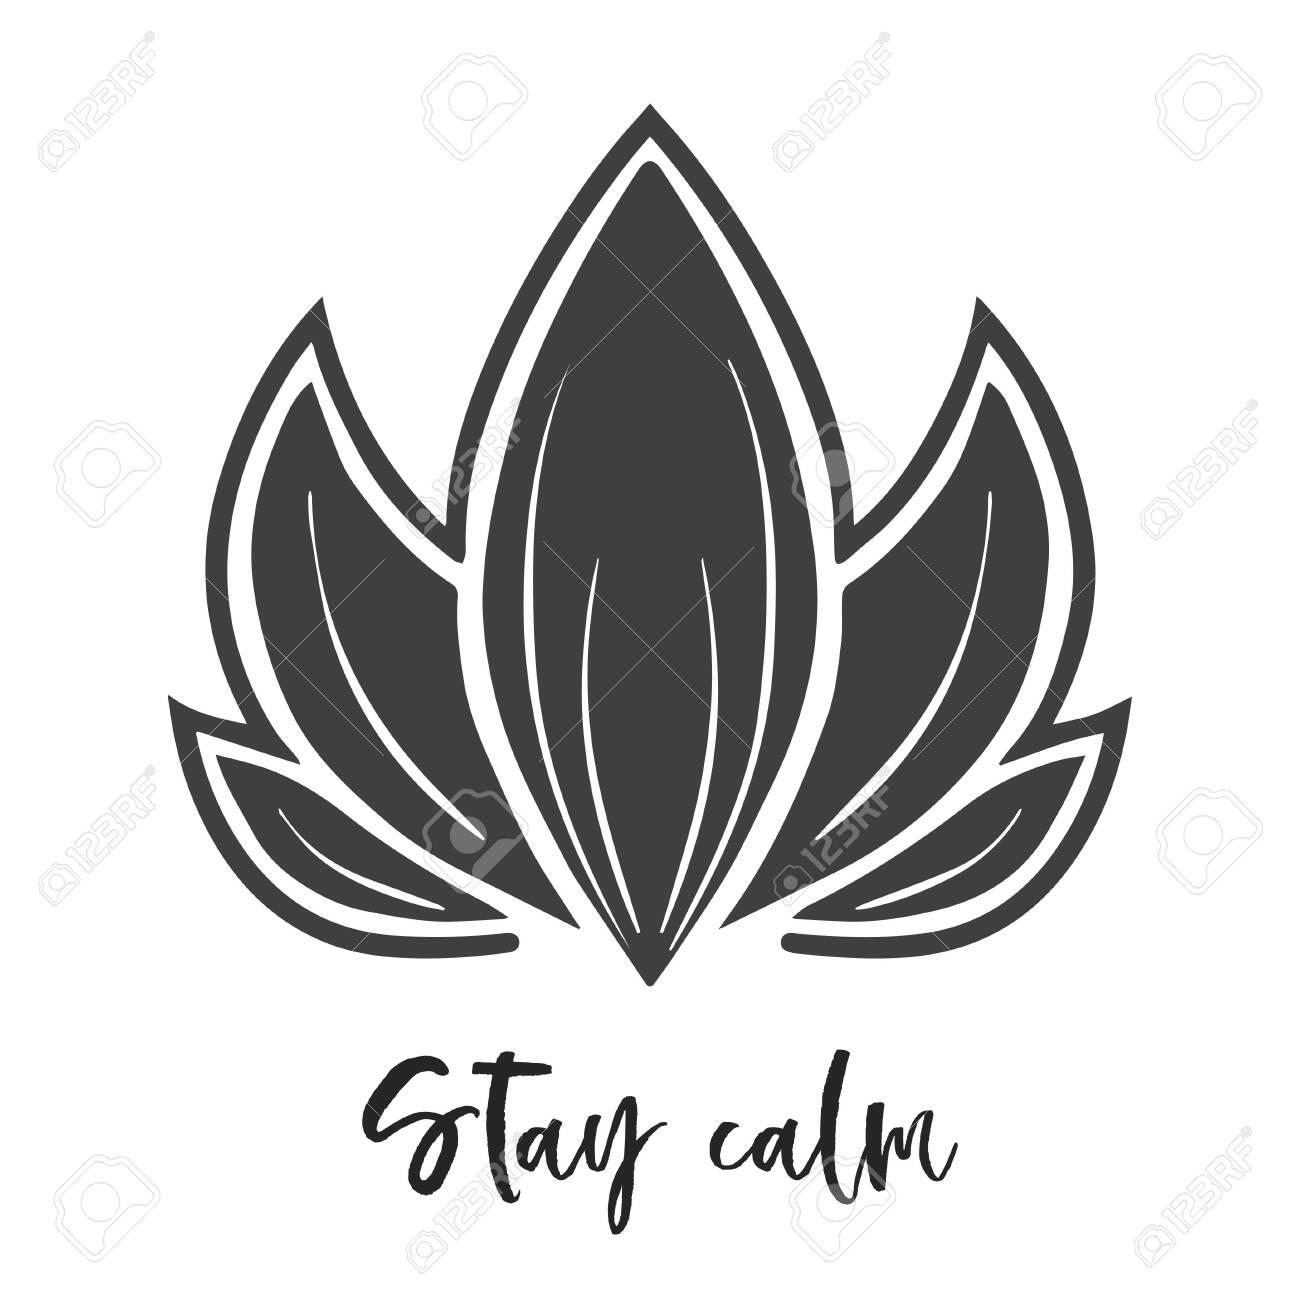 lotus flower, black vector, hand drawn minimalist style - 132919764